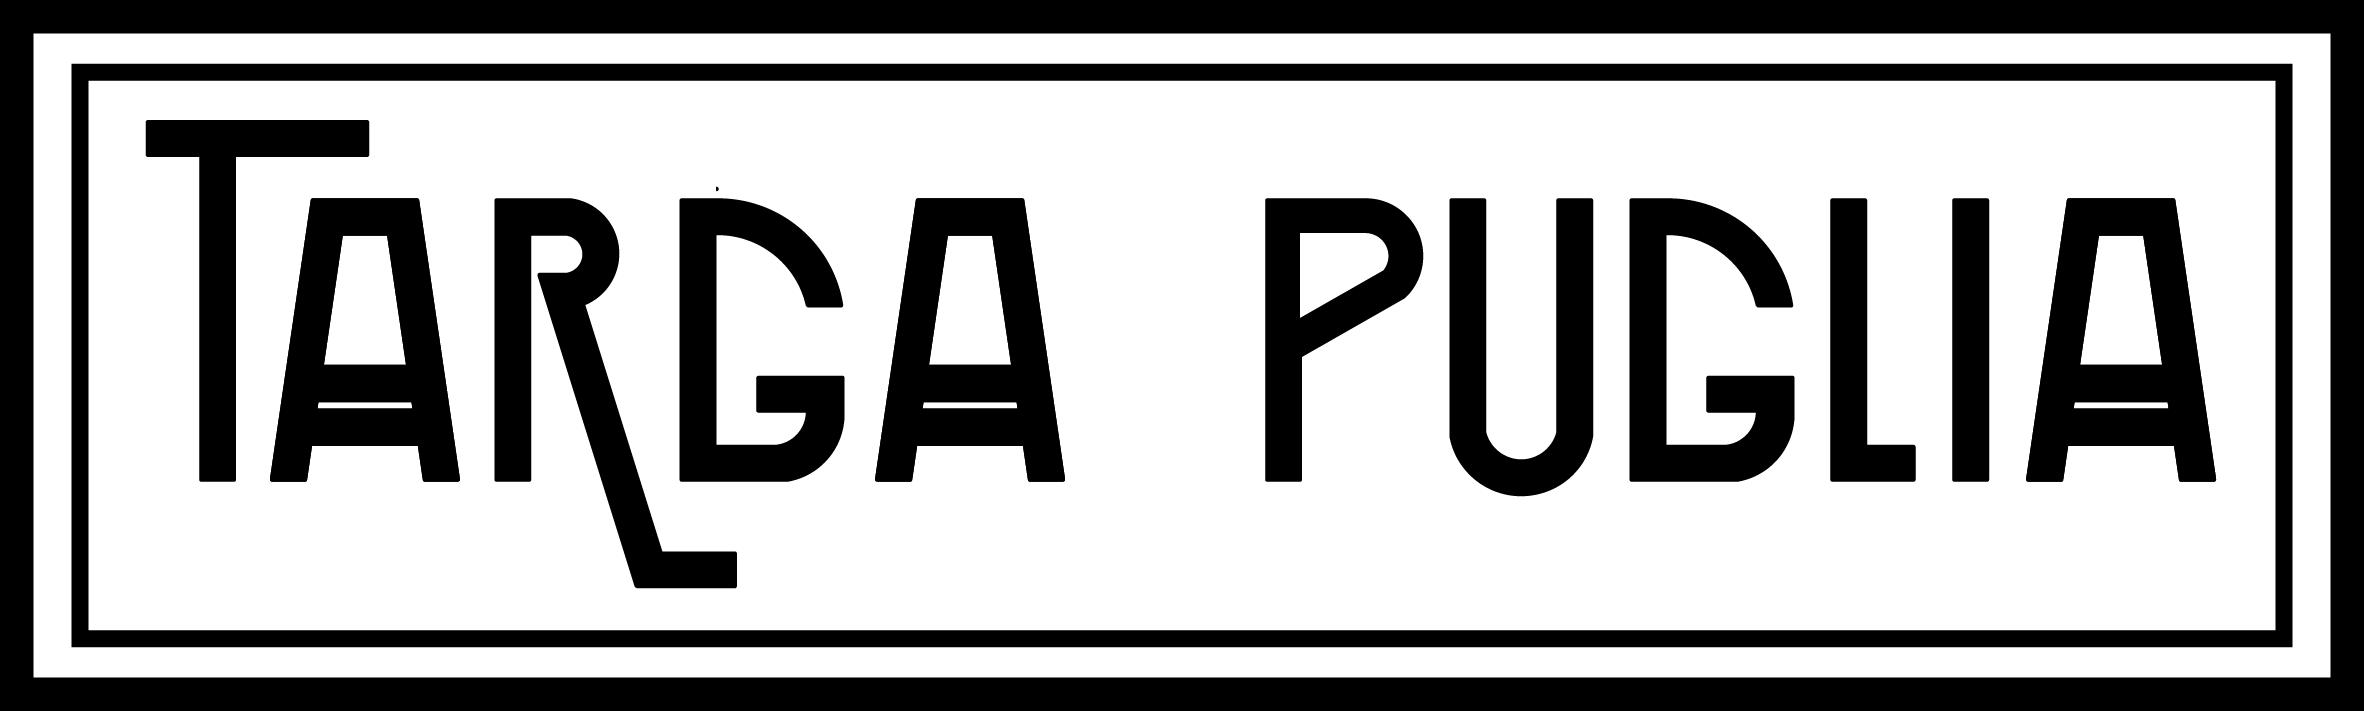 targa puglia logo semplificato-01